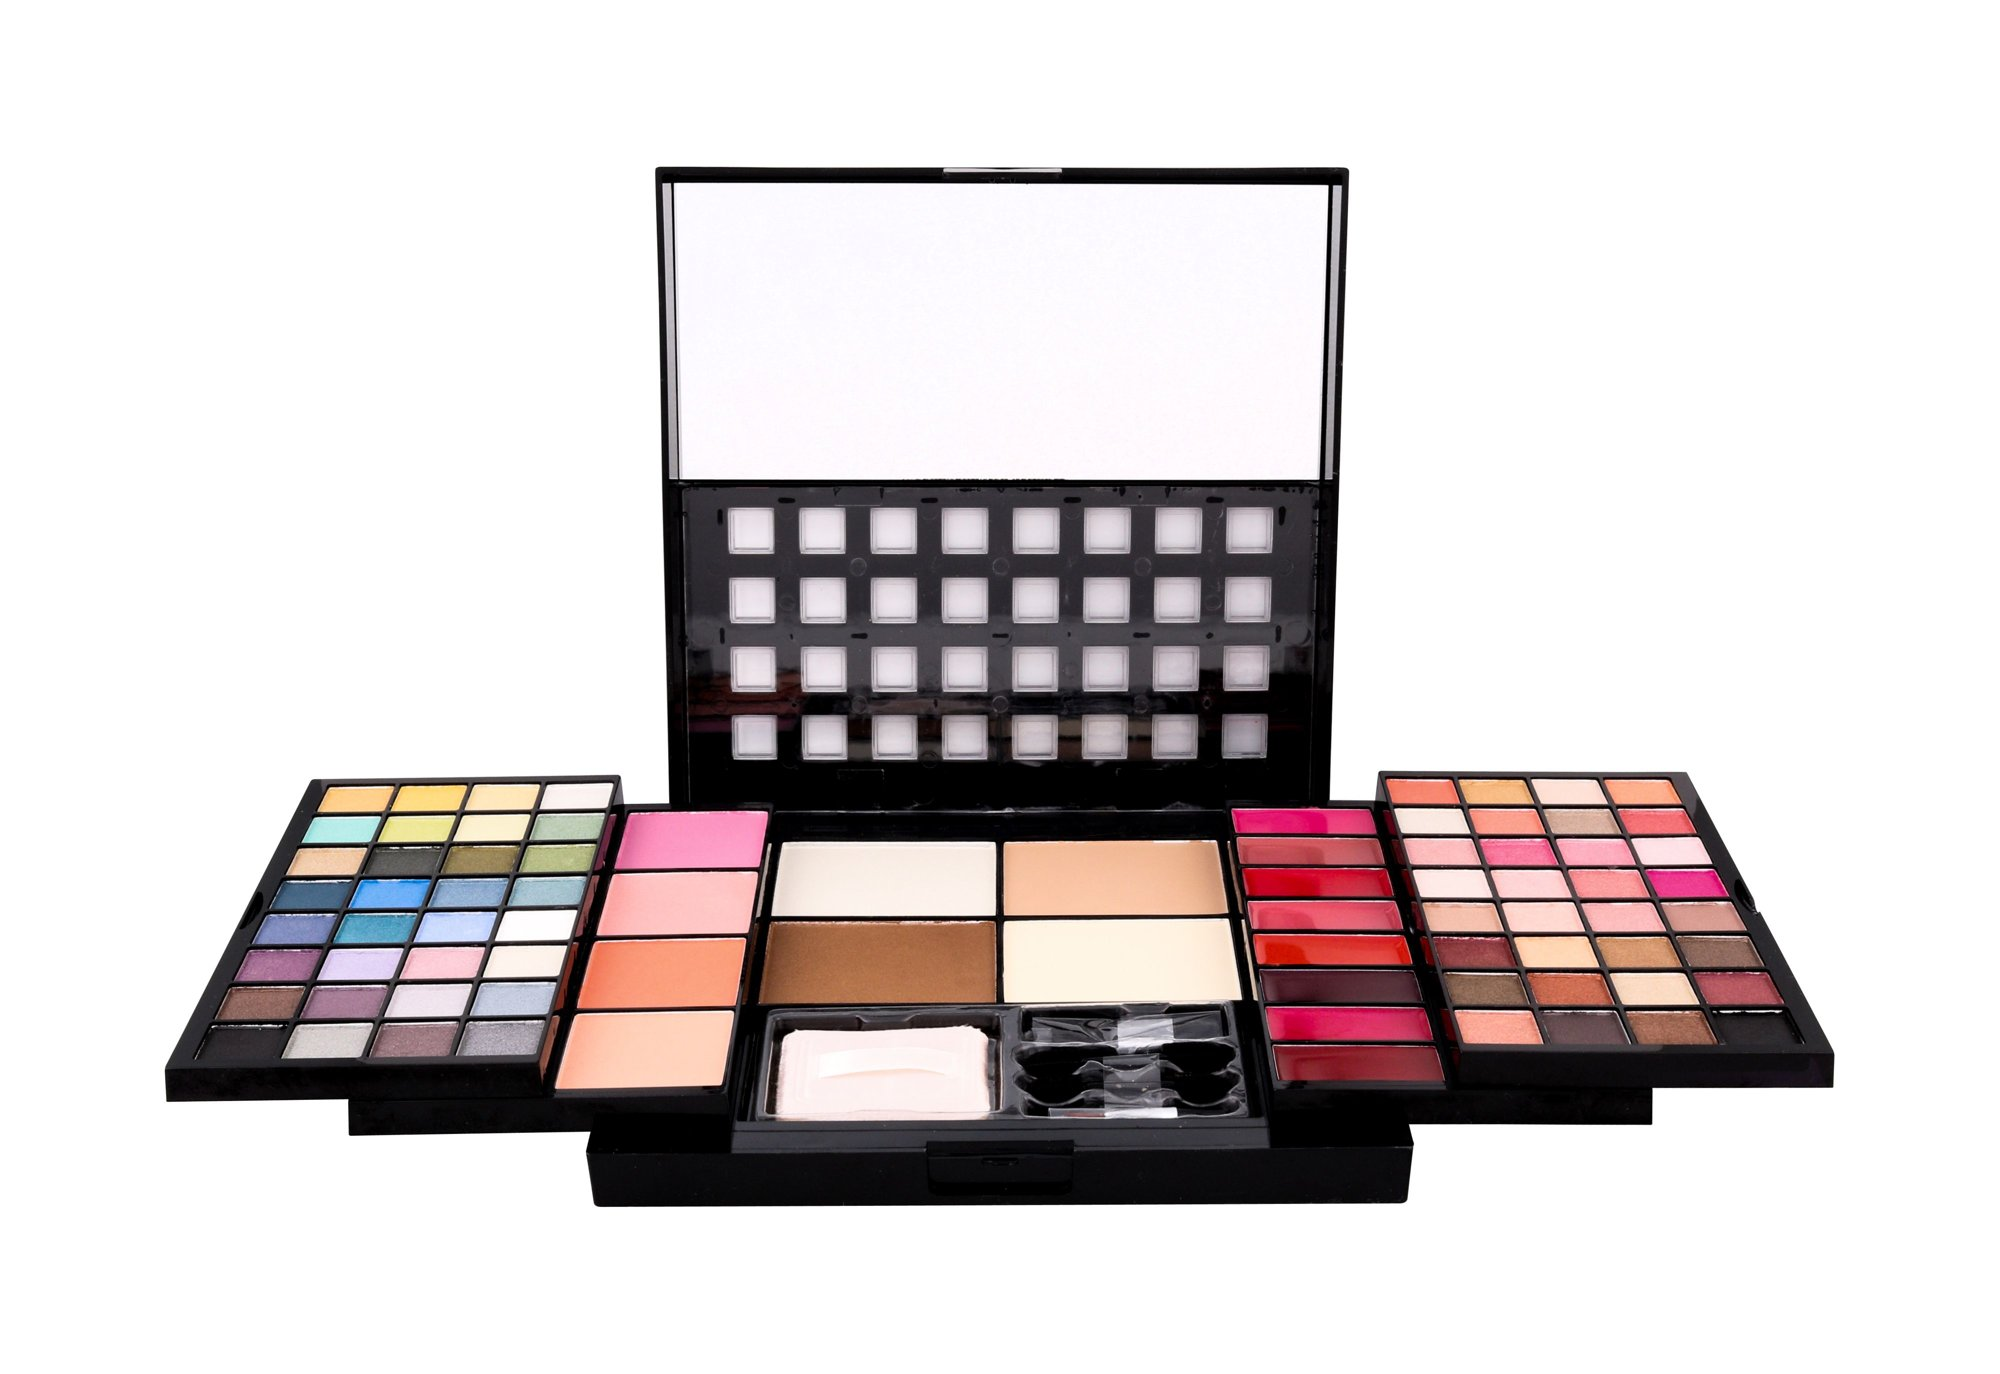 Makeup Trading 80 Favourite Colours, Complete Makeup Palette - poškodený obal